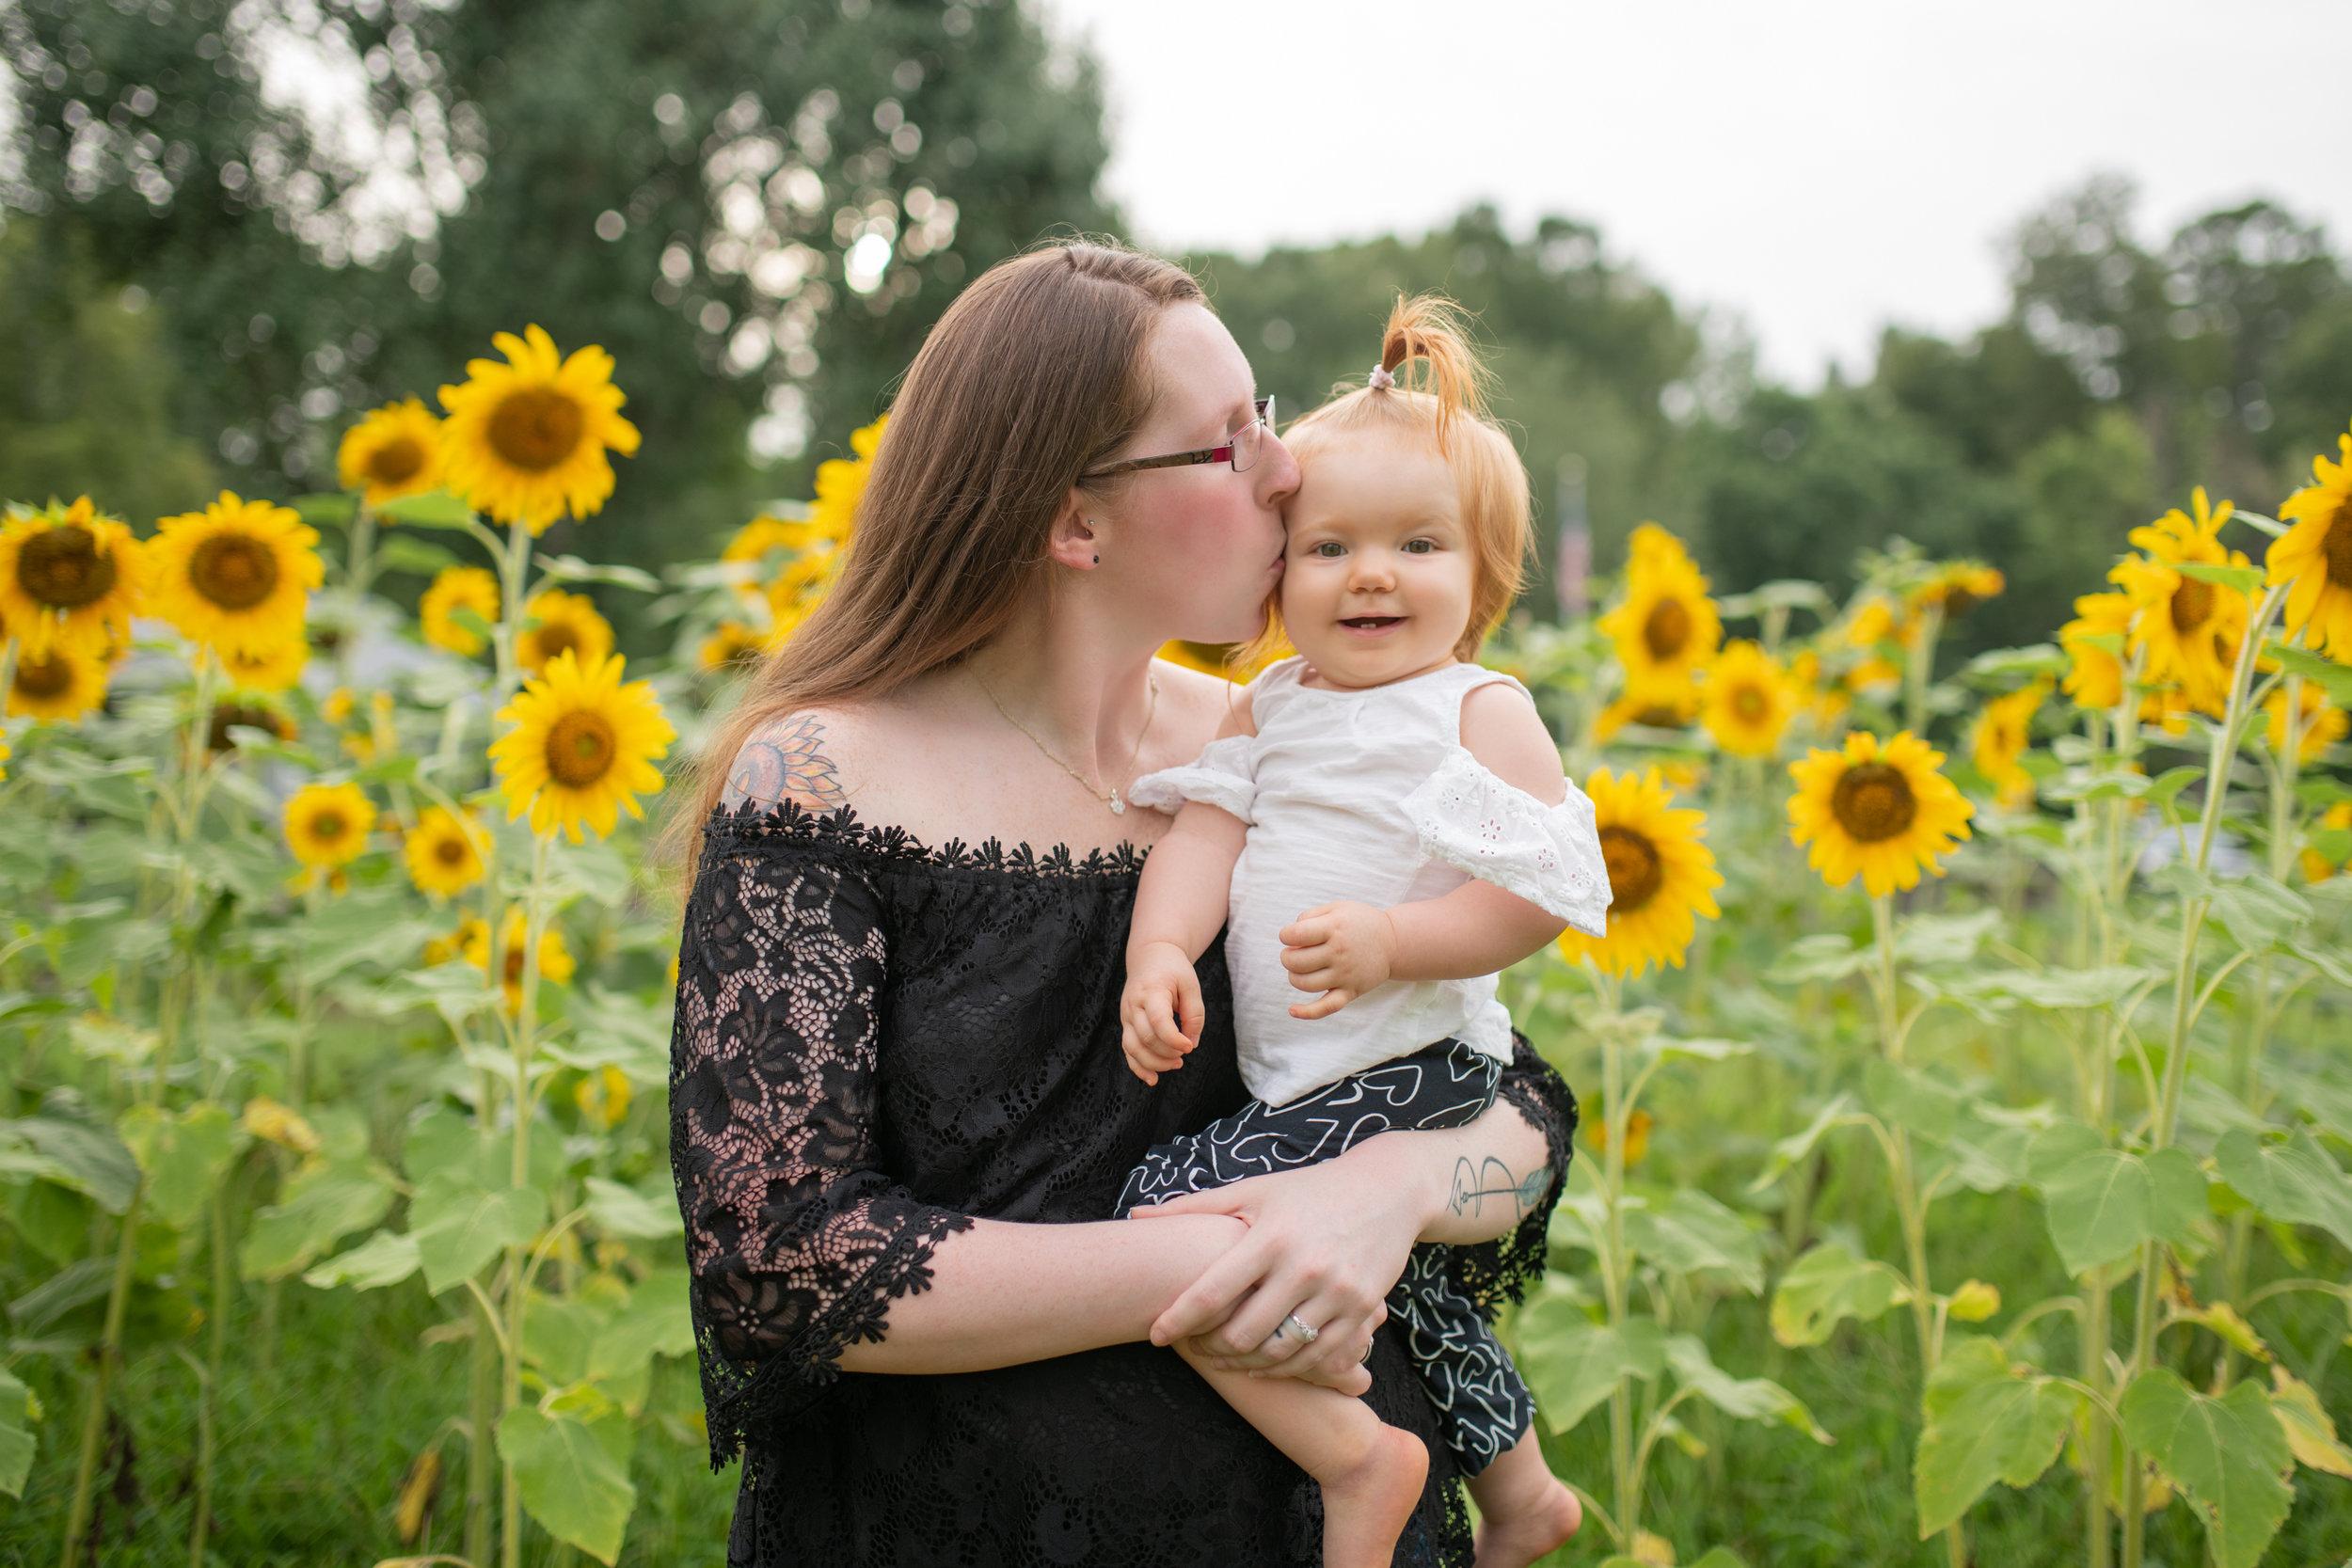 Sunflowers-Favs-8.jpg